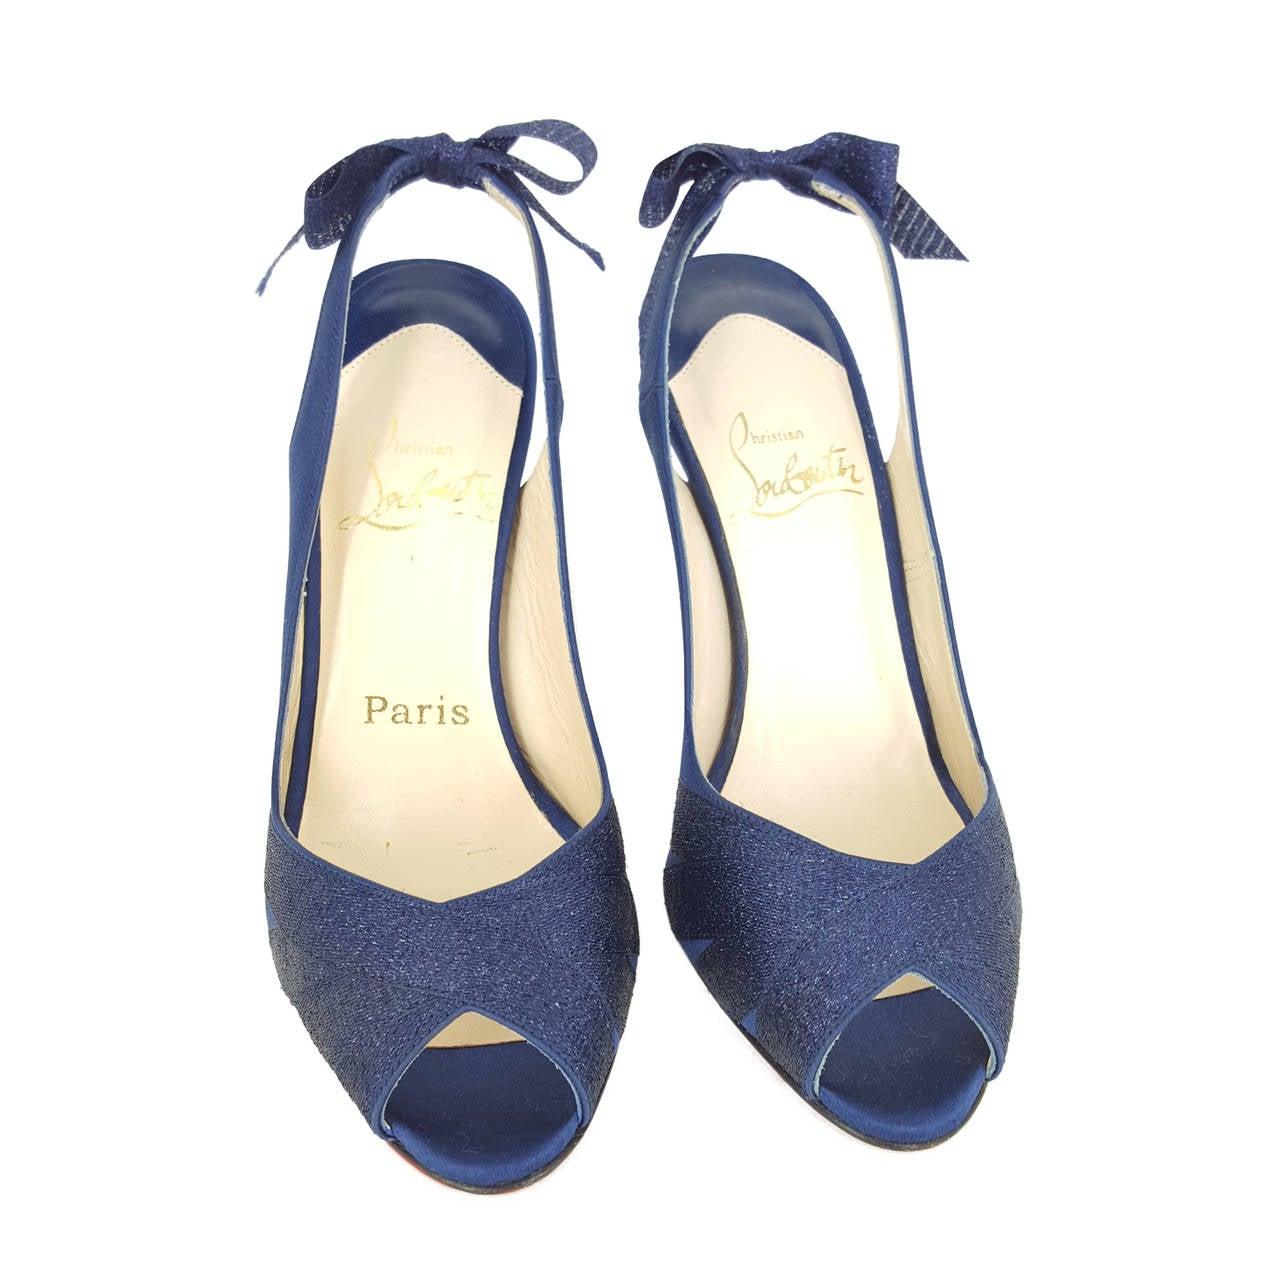 New Acura Dealership In Delray Beach Fl 33483: Christian Louboutin Navy Blue Sparkle Sling Back Heels